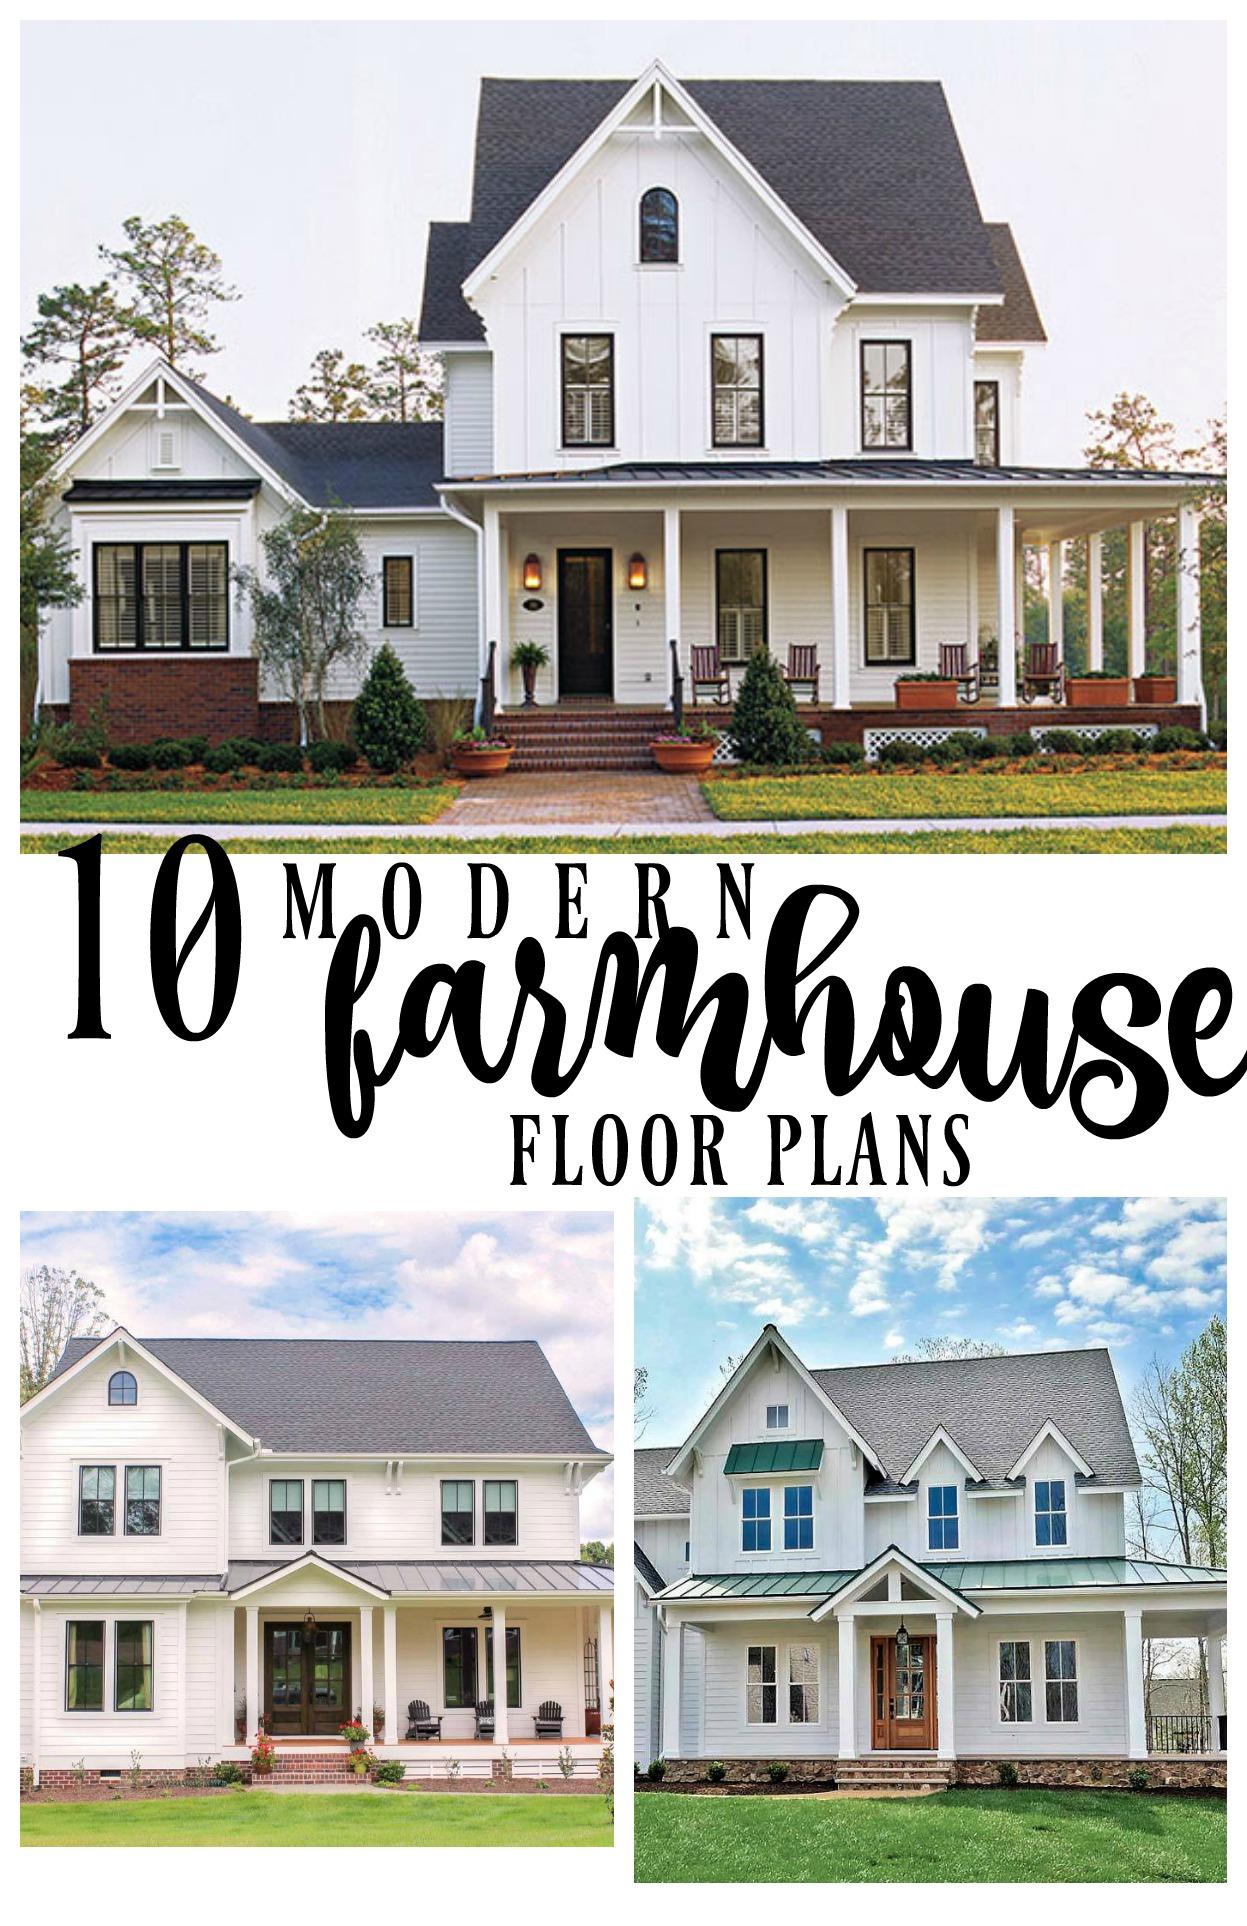 10 Modern Farmhouse Floor Plans I Love Rooms For Rent blog – House Model With Floor Plan